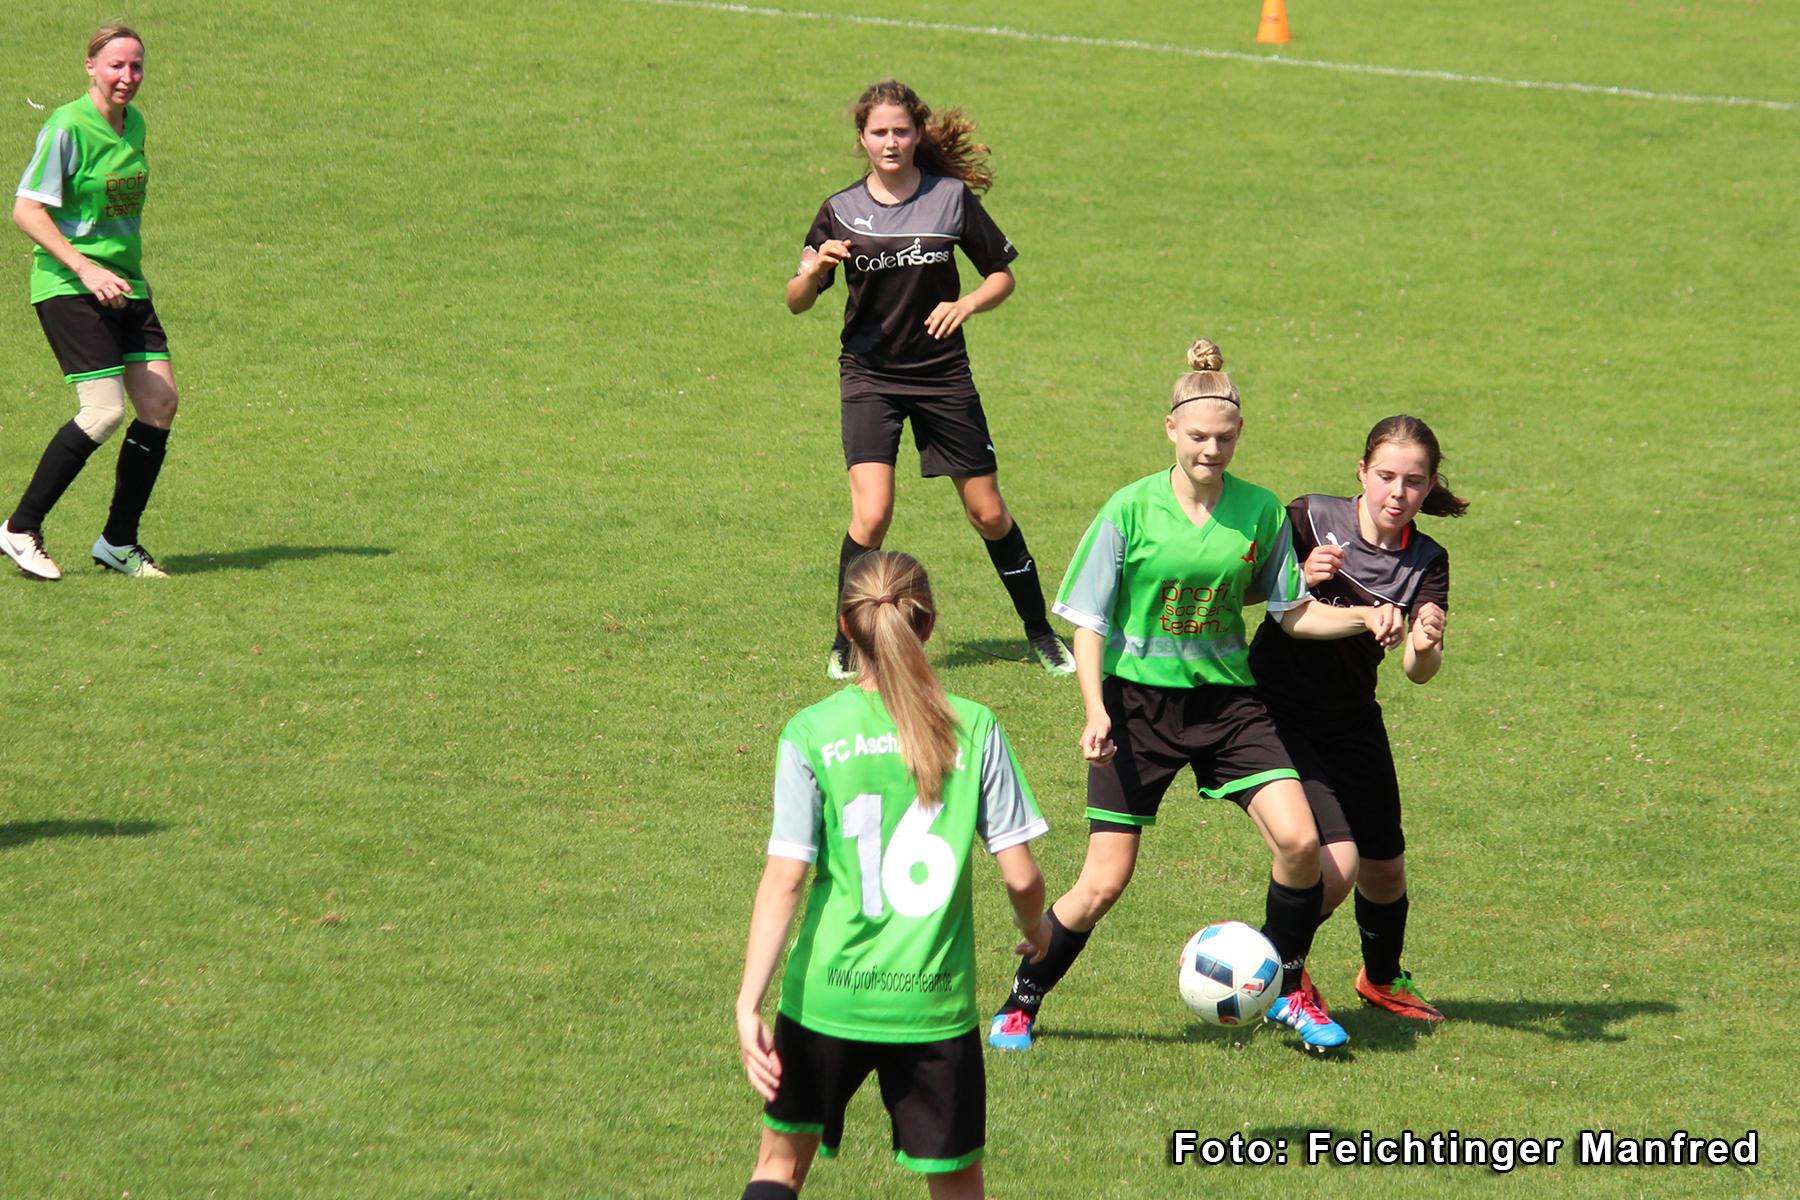 Union Neuhofen vs. FC Aschach